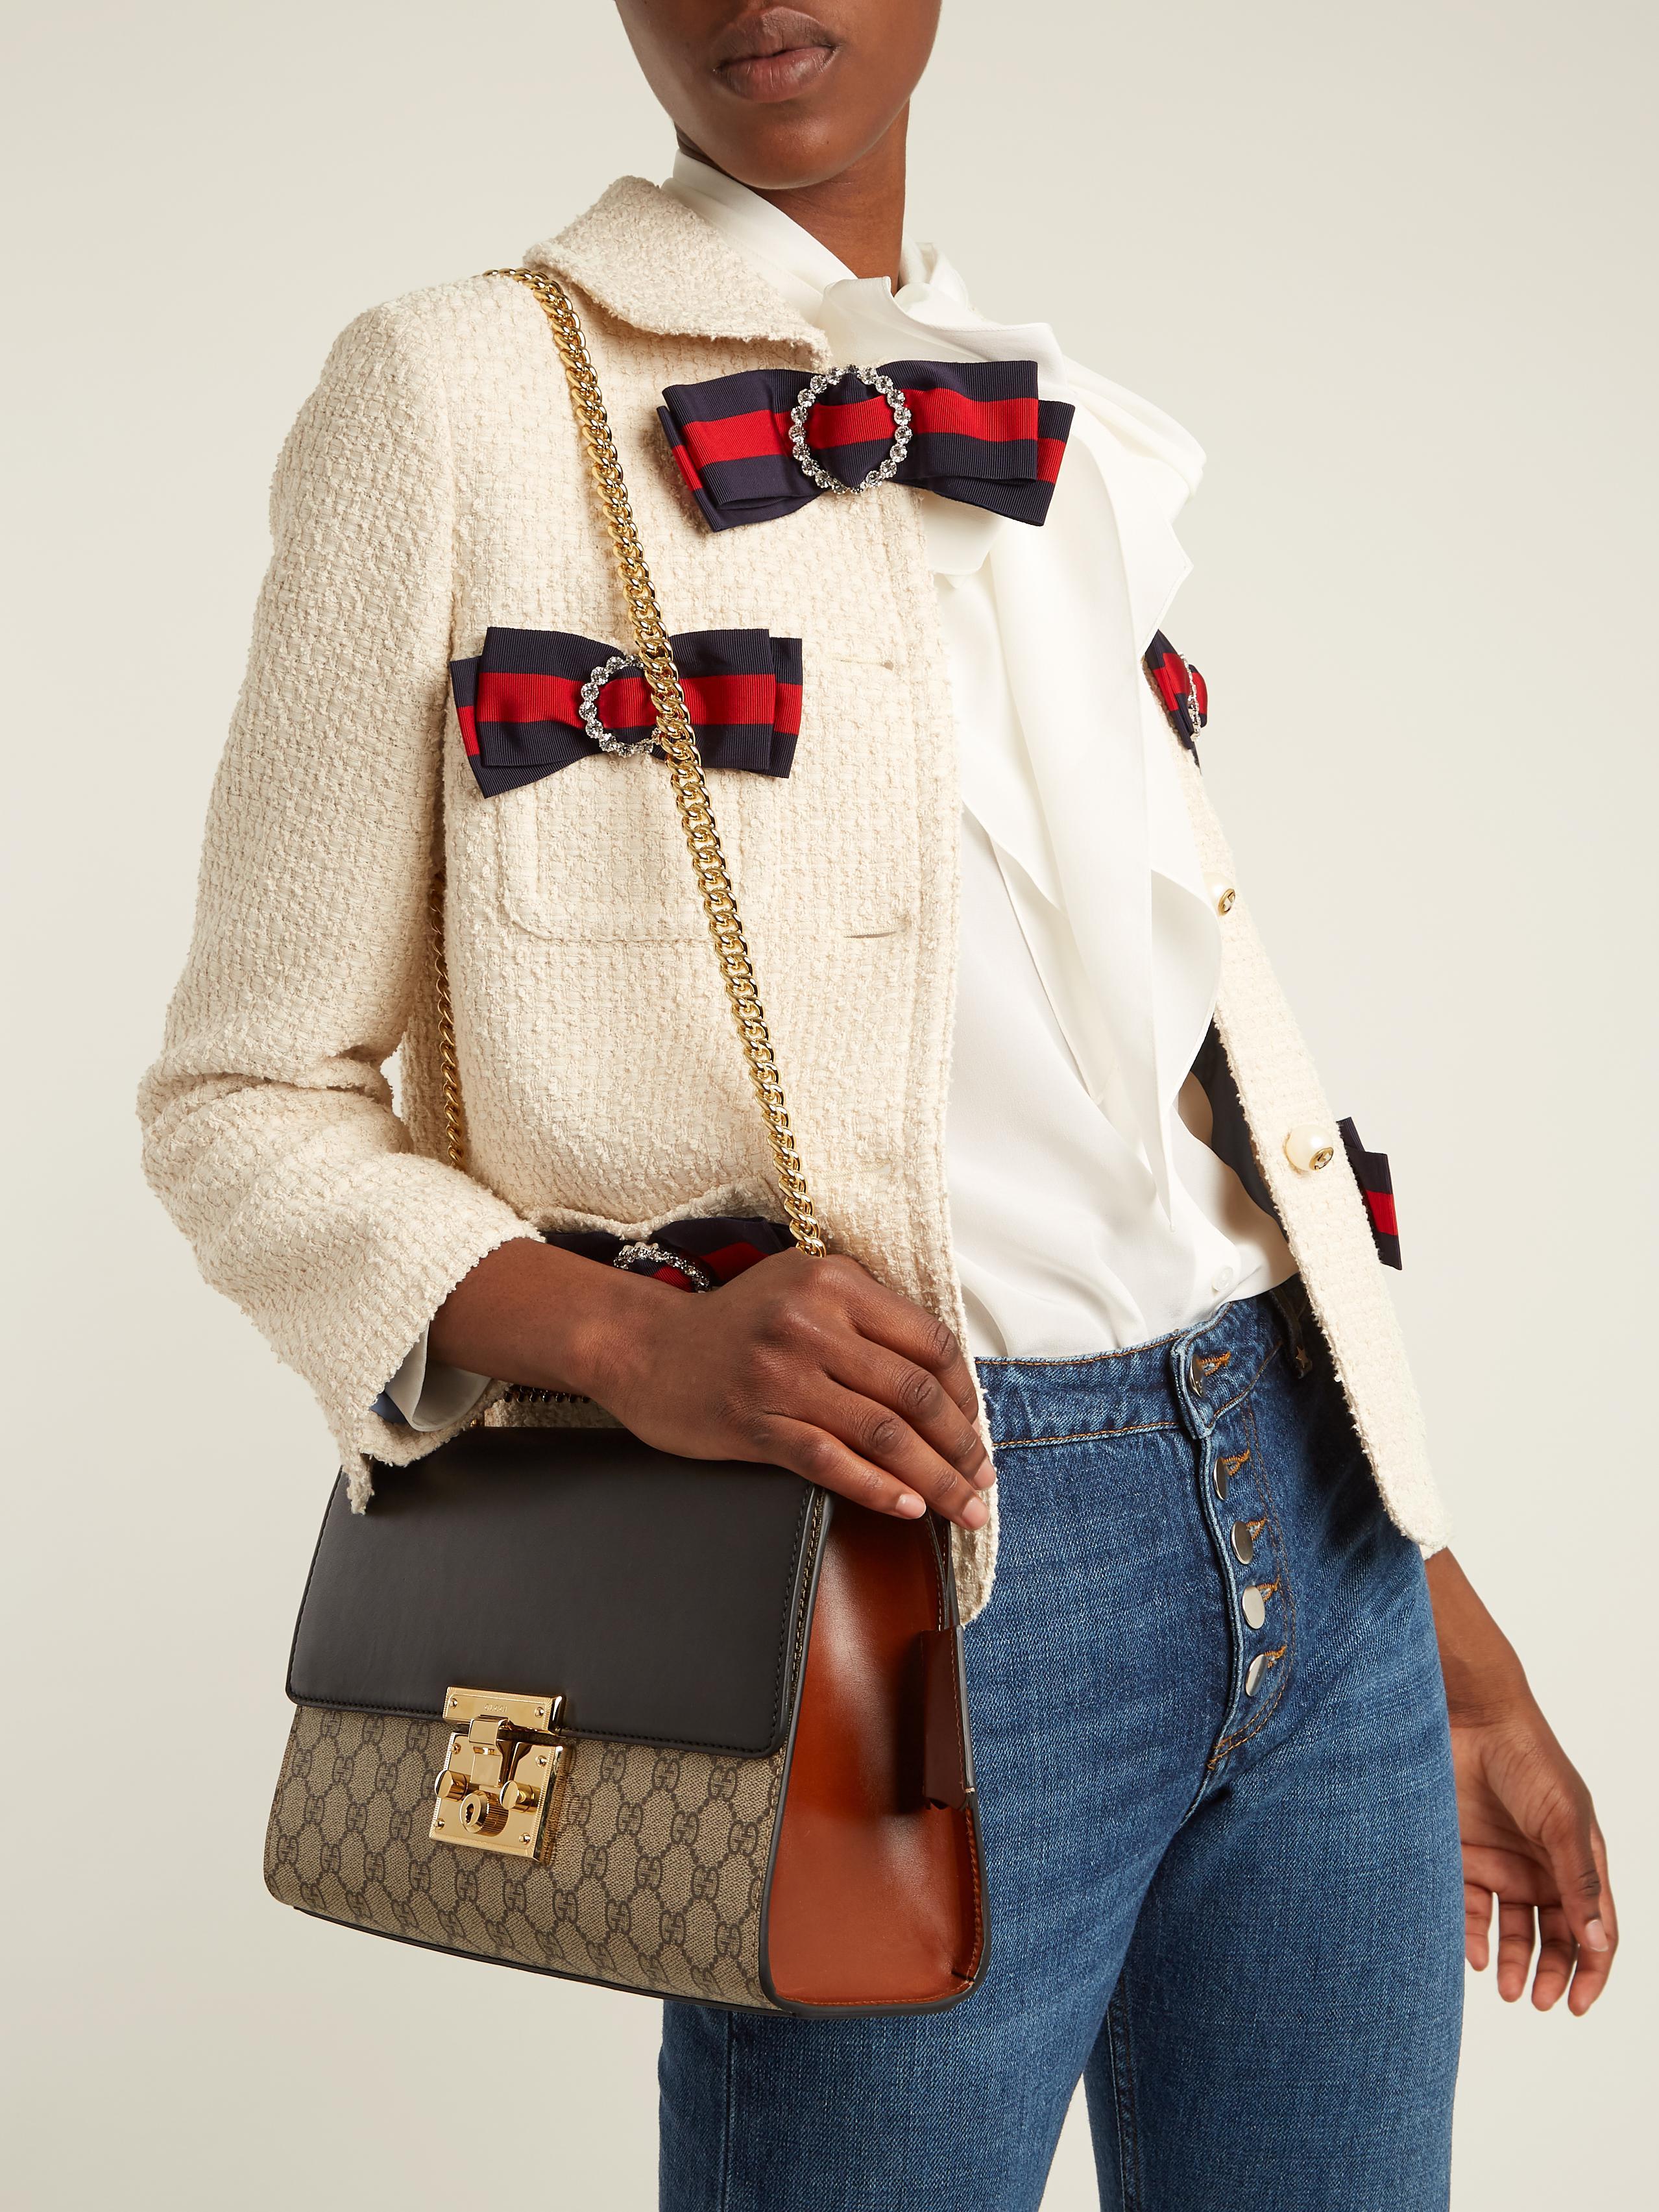 0321184b28d6 Gucci Padlock Gg Supreme Medium Shoulder Bag - Lyst